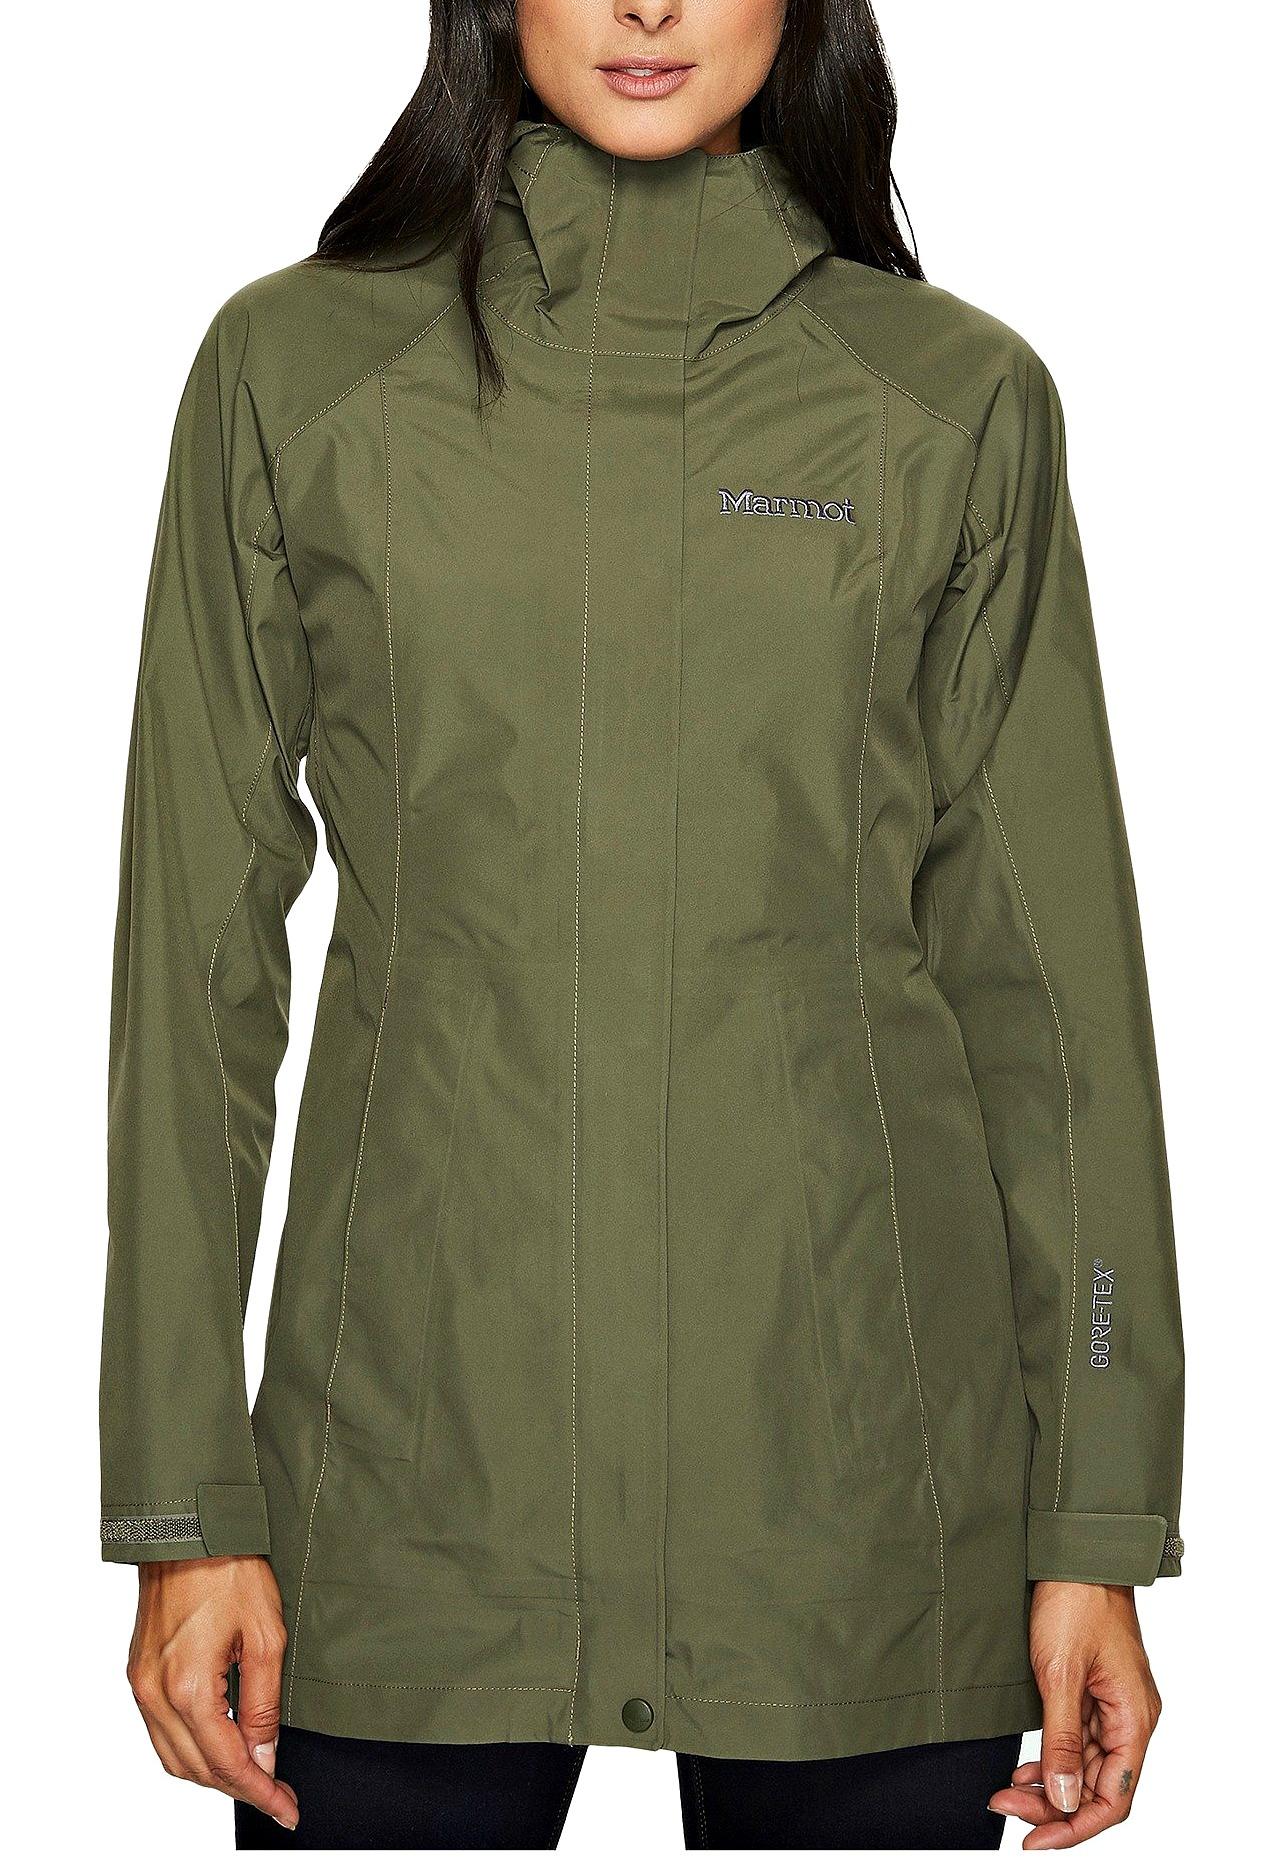 Captivating The Best Waterproof Jacket For Ireland